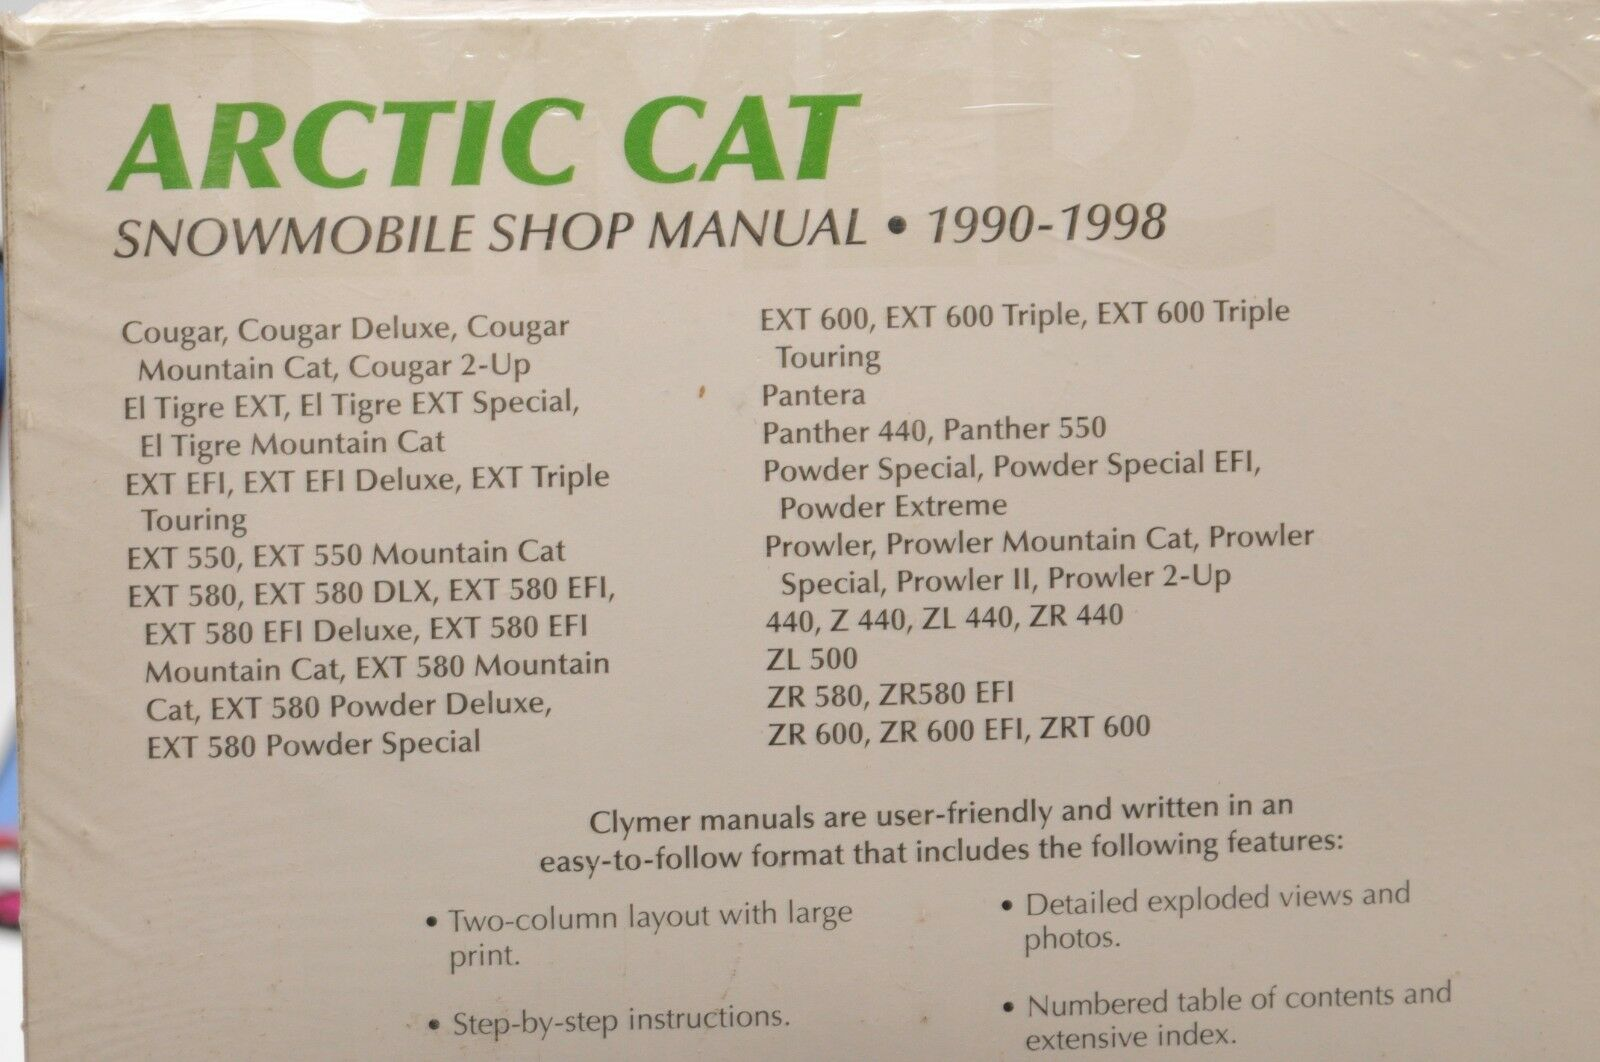 Clymer Arctic Cat Snowmobile Shop Manual 1990 1998 Ebay Wiring Diagram Z440